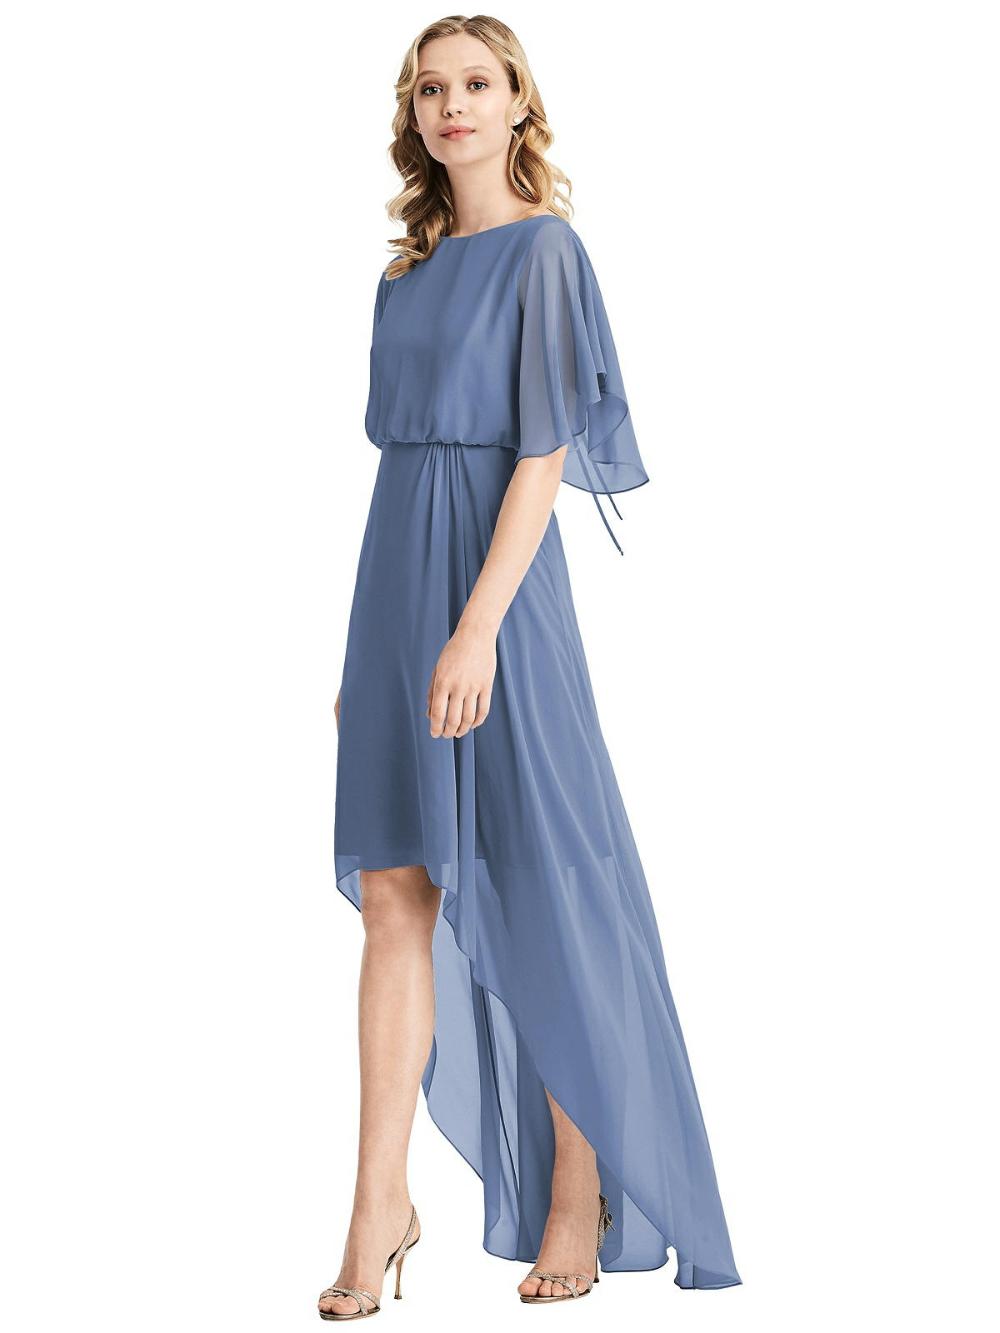 Flutter Sleeve High Low Cocktail Dress Cocktail Dresses With Sleeves High Low Cocktail Dress Long Sleeve Cocktail Dress [ 1333 x 1000 Pixel ]